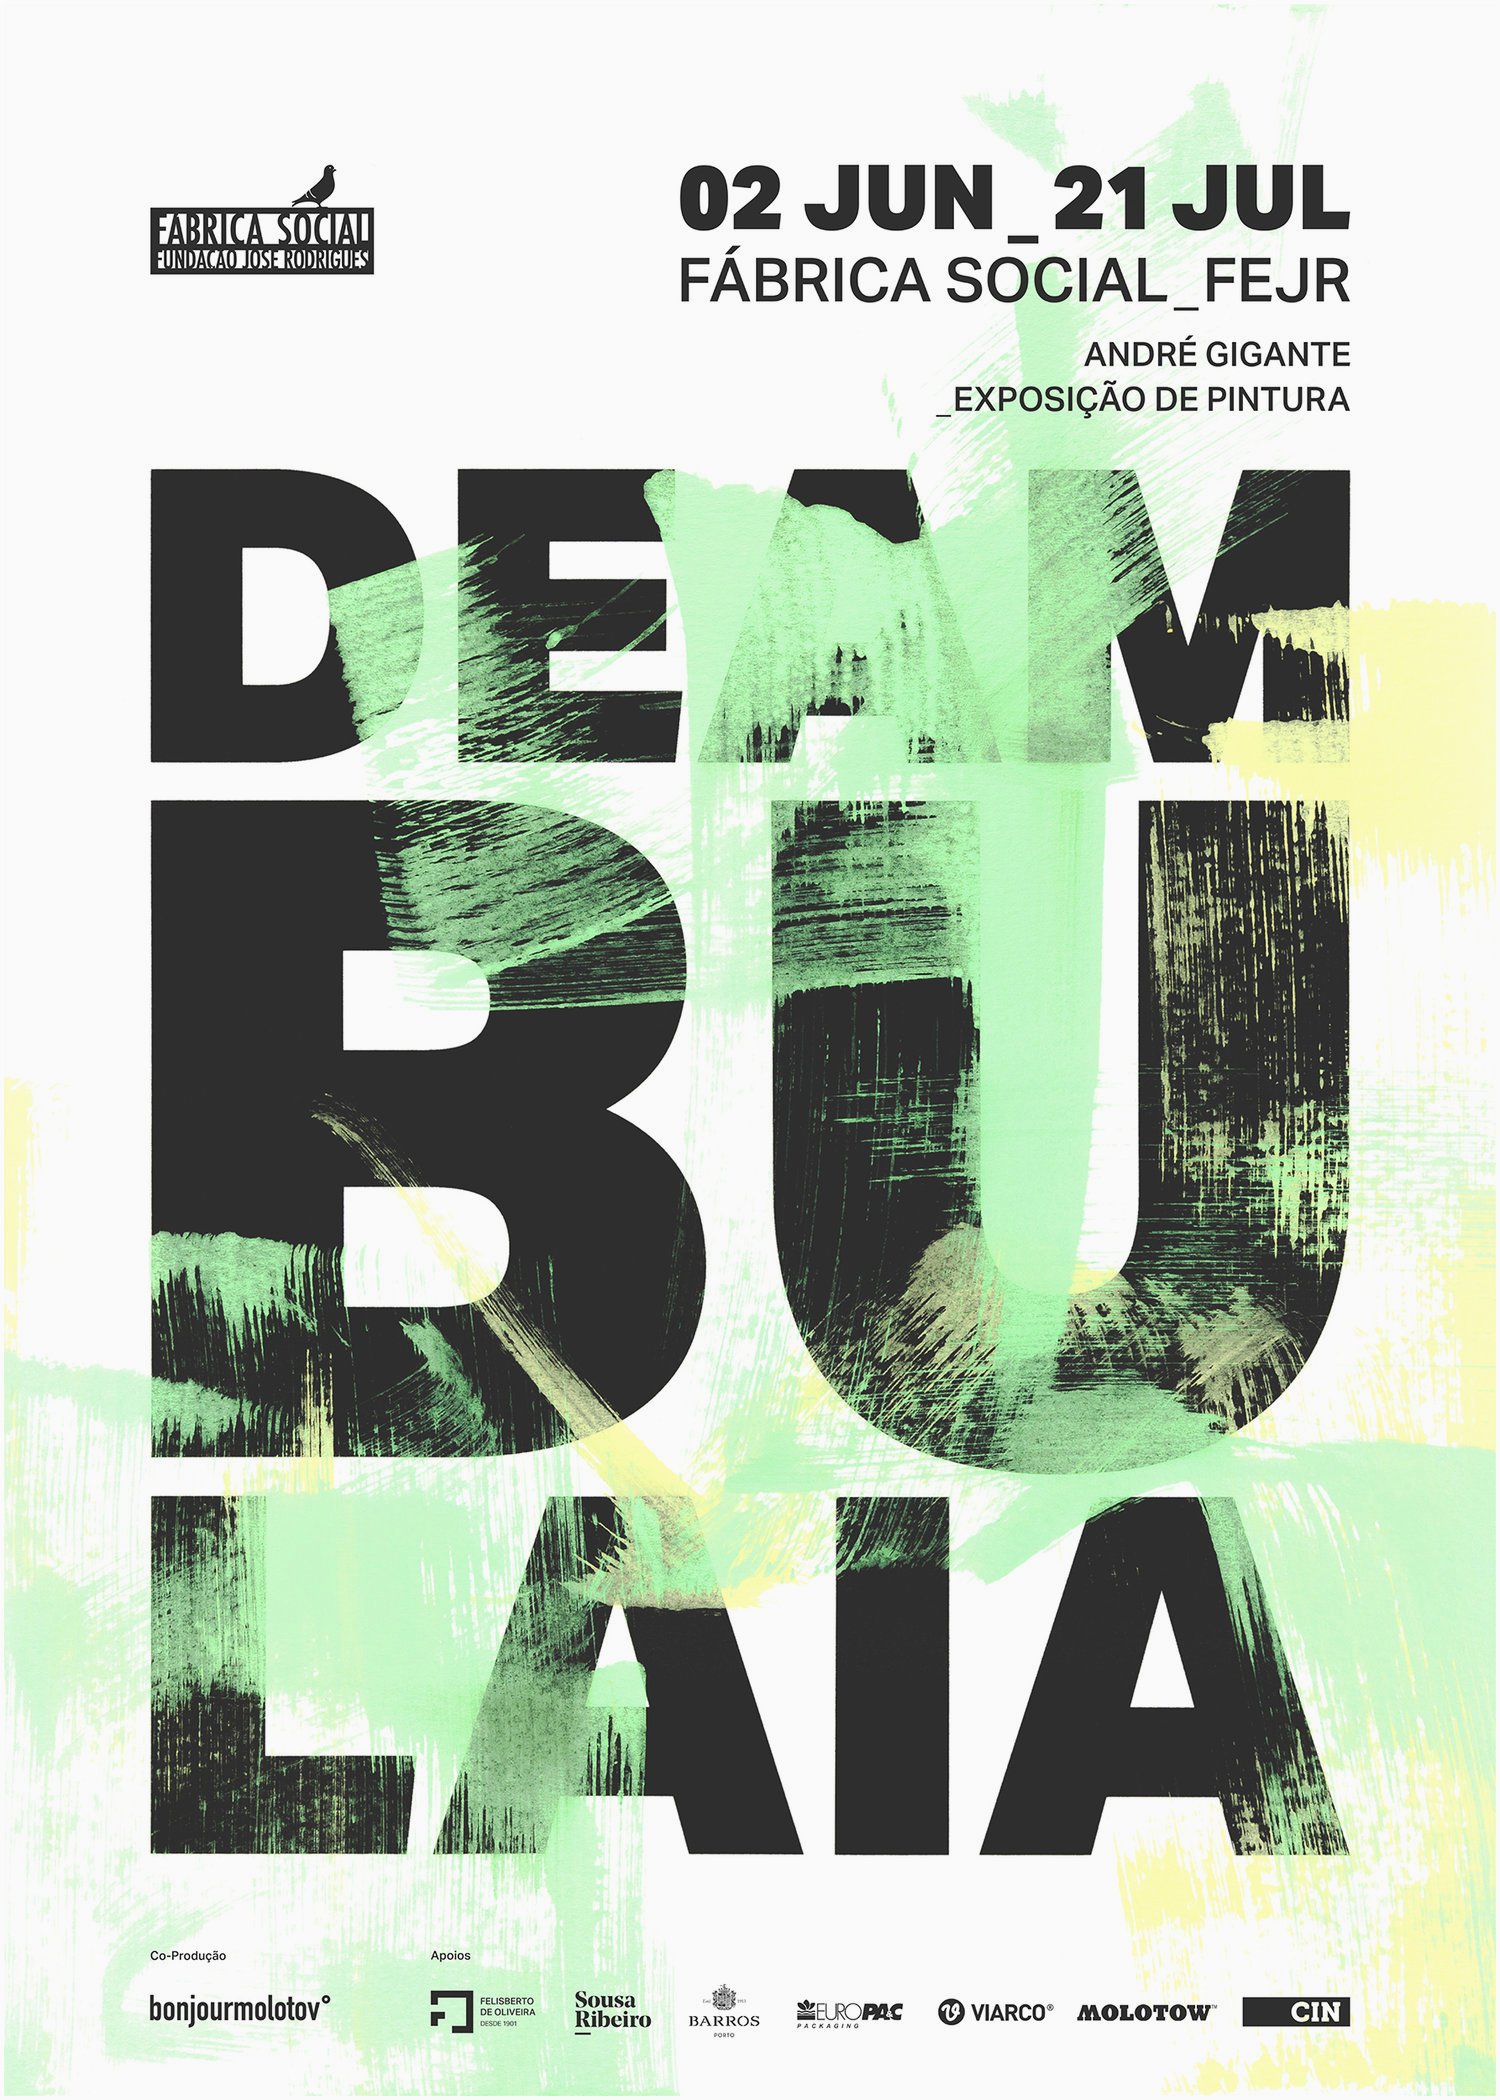 Deambulaia+Andre+Gigante+Flyers+03.jpg